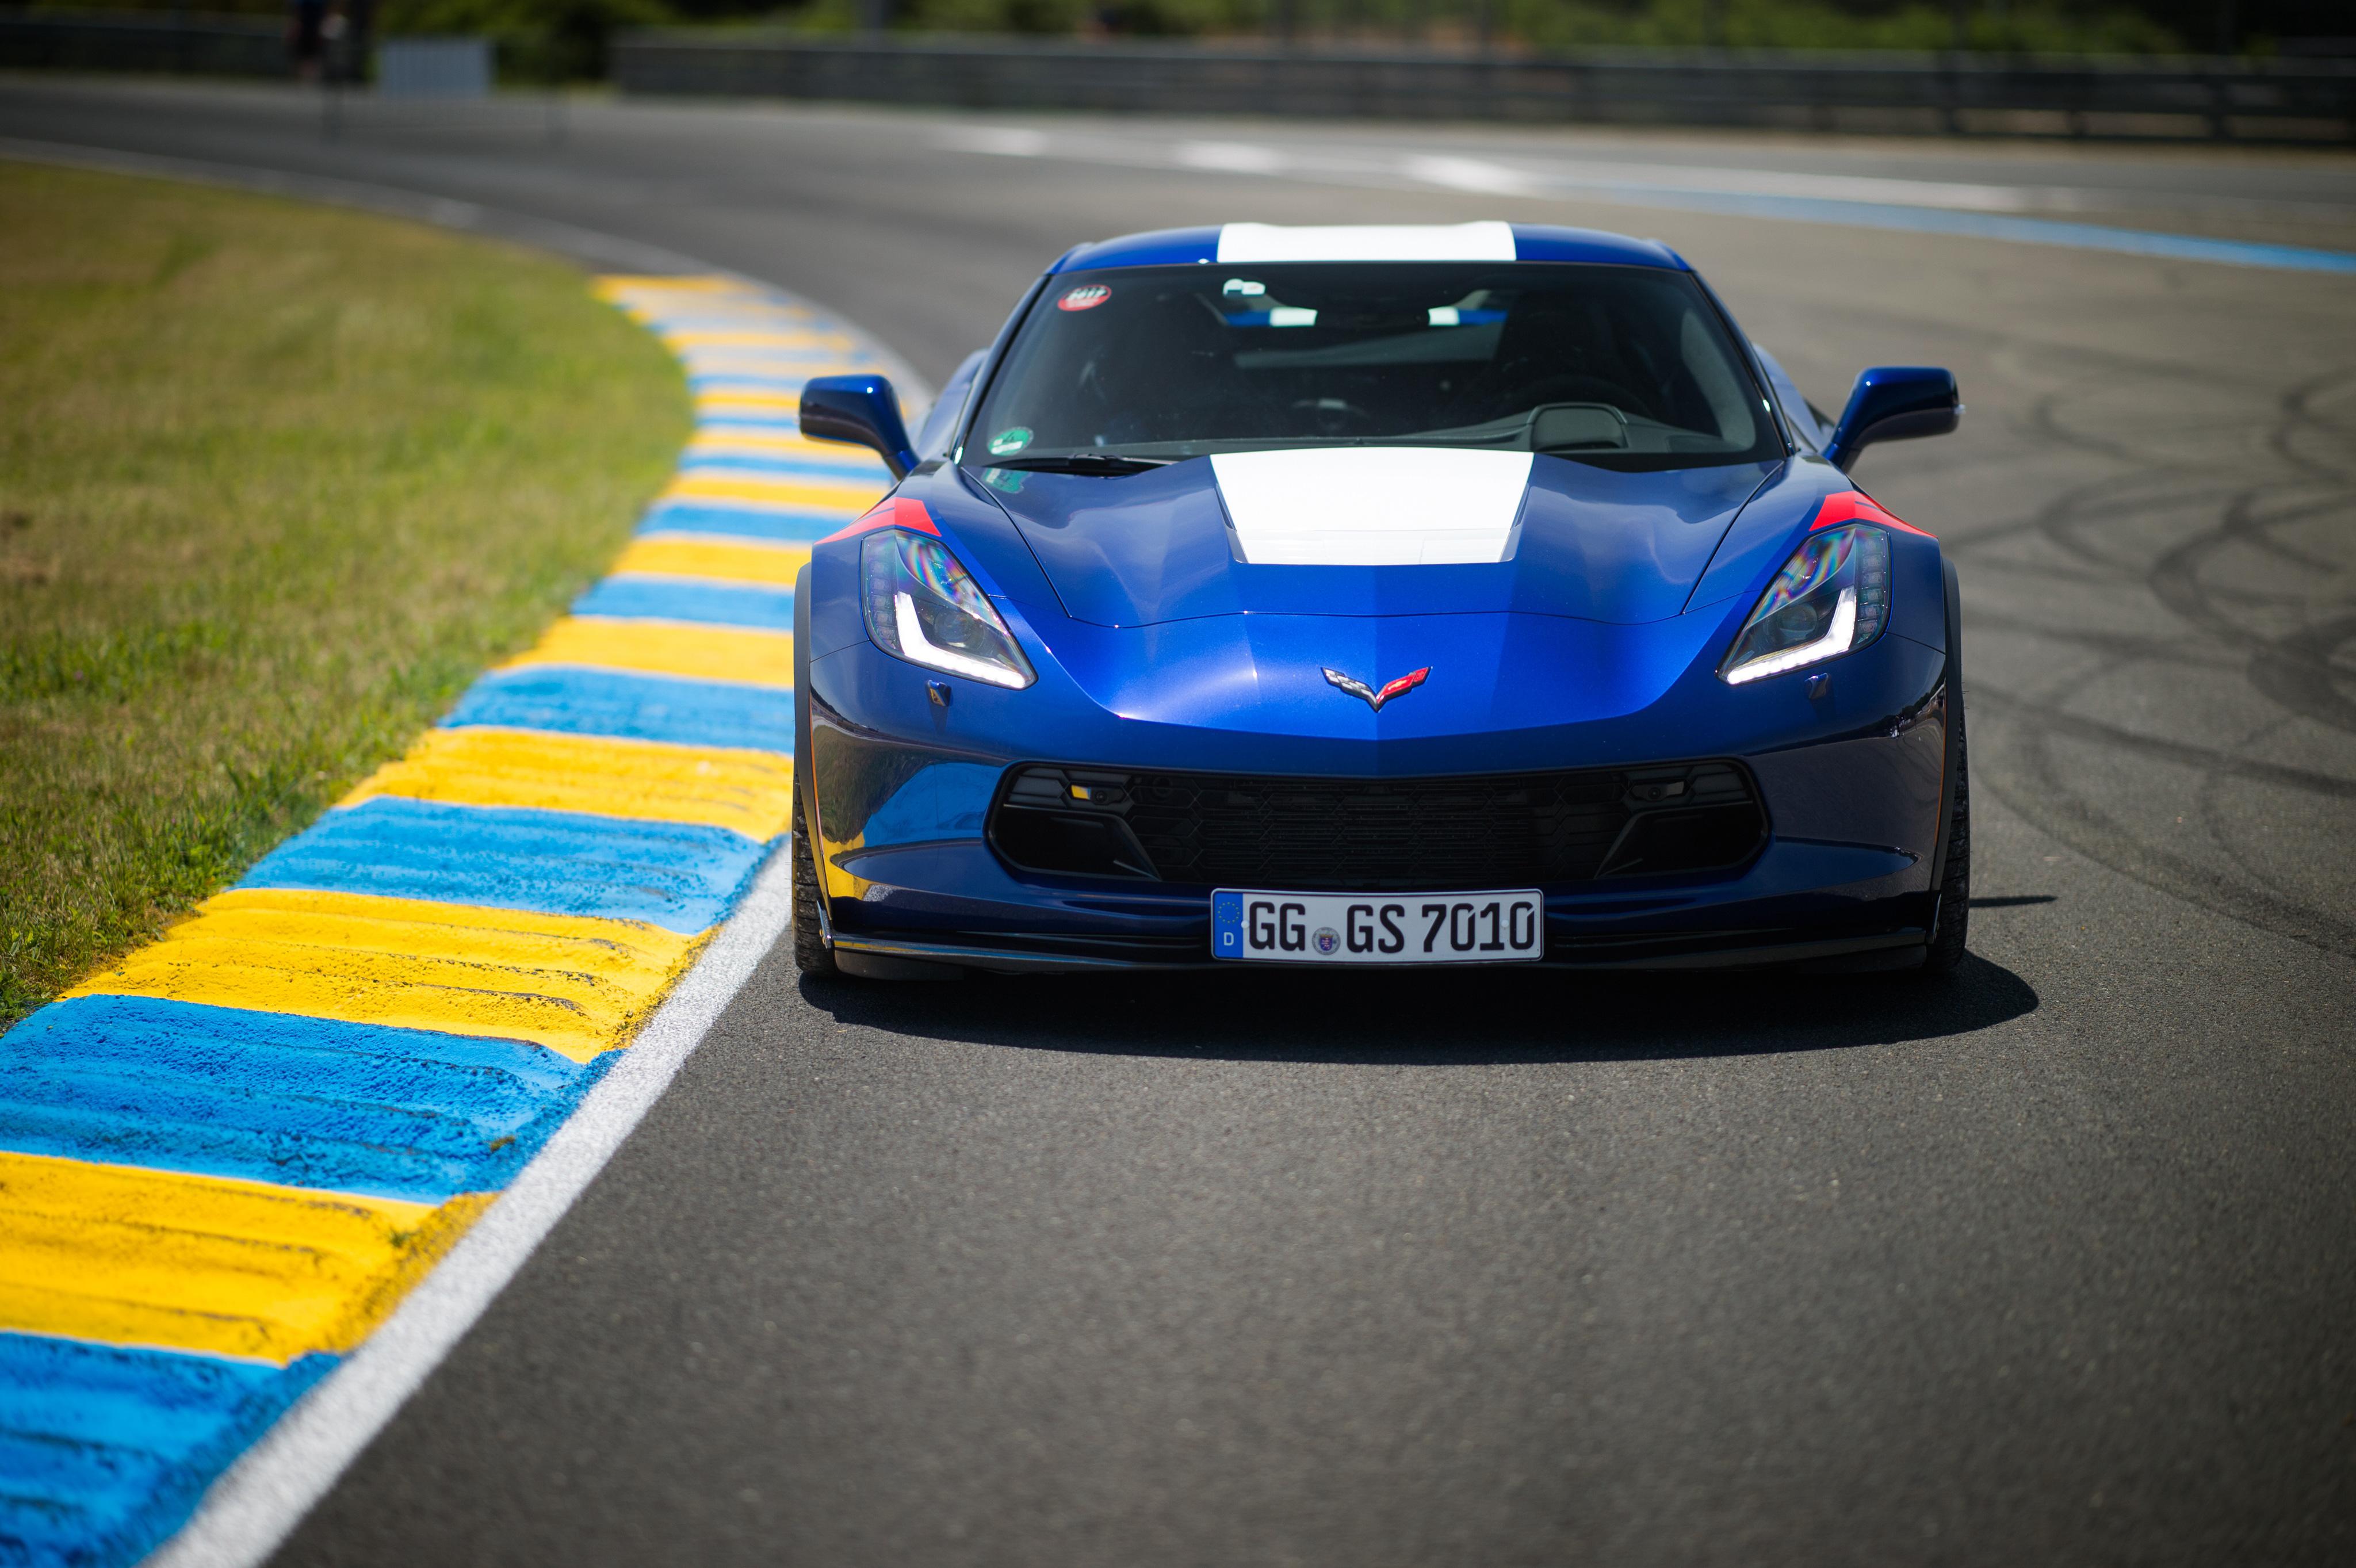 Corvette Grand Sport Iphone Wallpaper: 1366x768 Chevrolet Corvette Grand Sport Front 1366x768